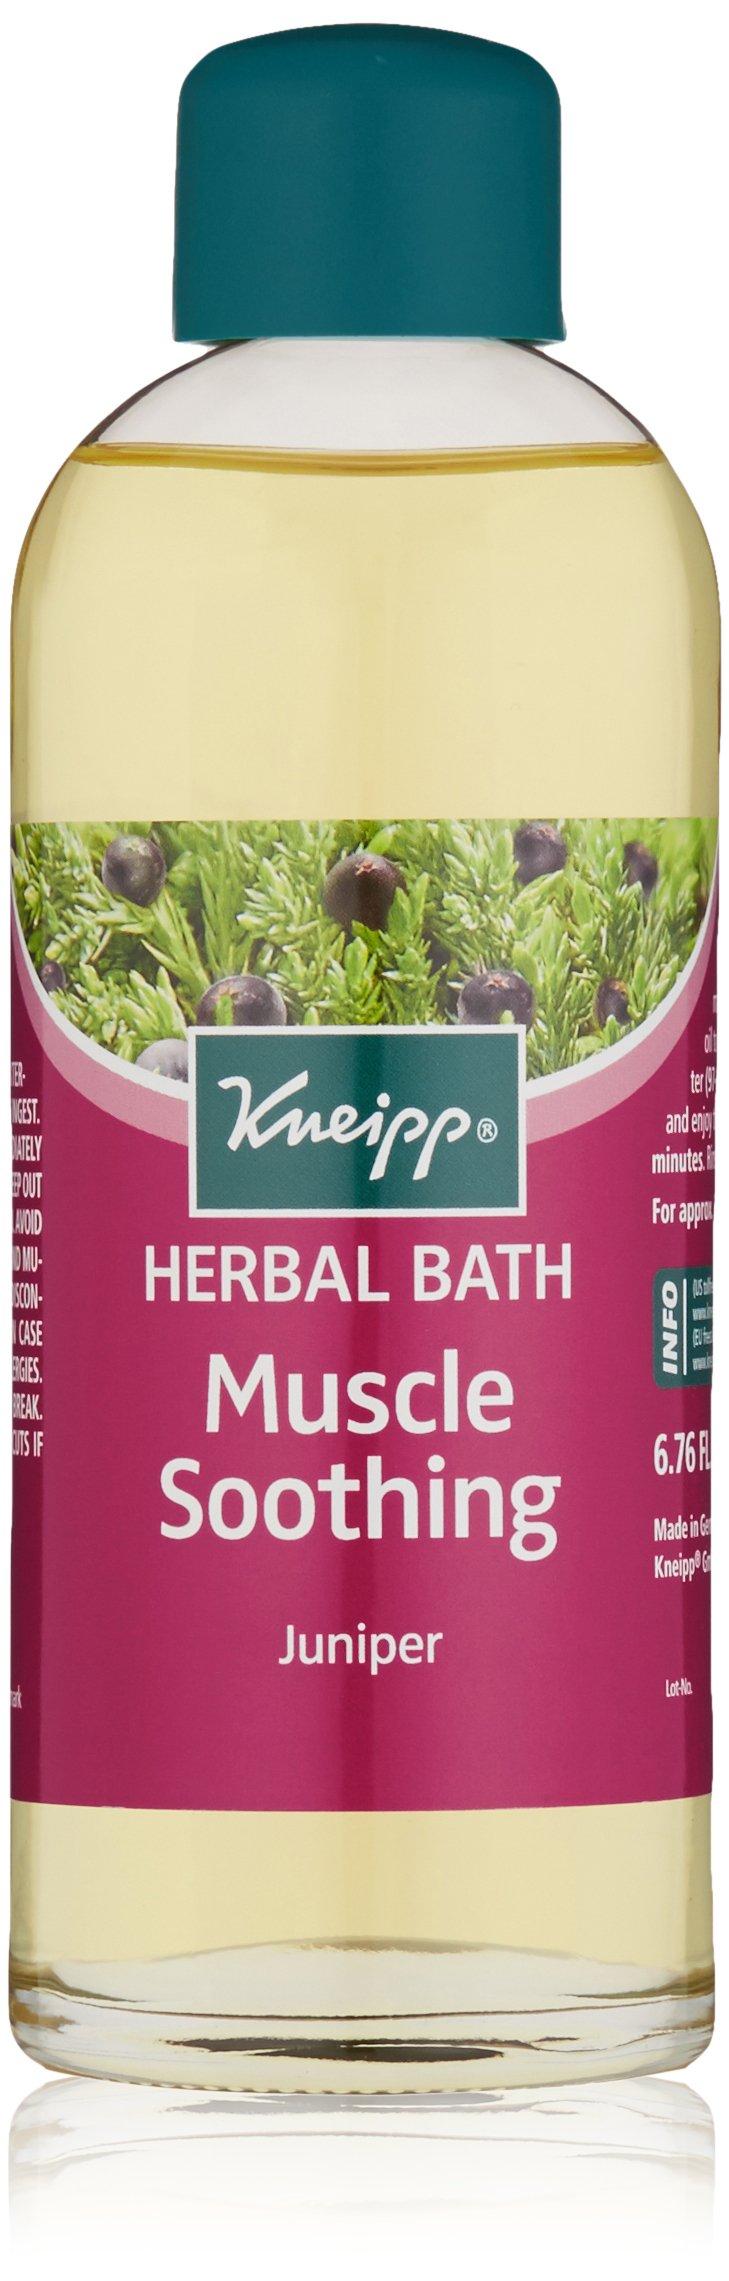 Cheapest amazon herbs - Kneipp Herbal Bath Value Size 6 76 Fl Oz